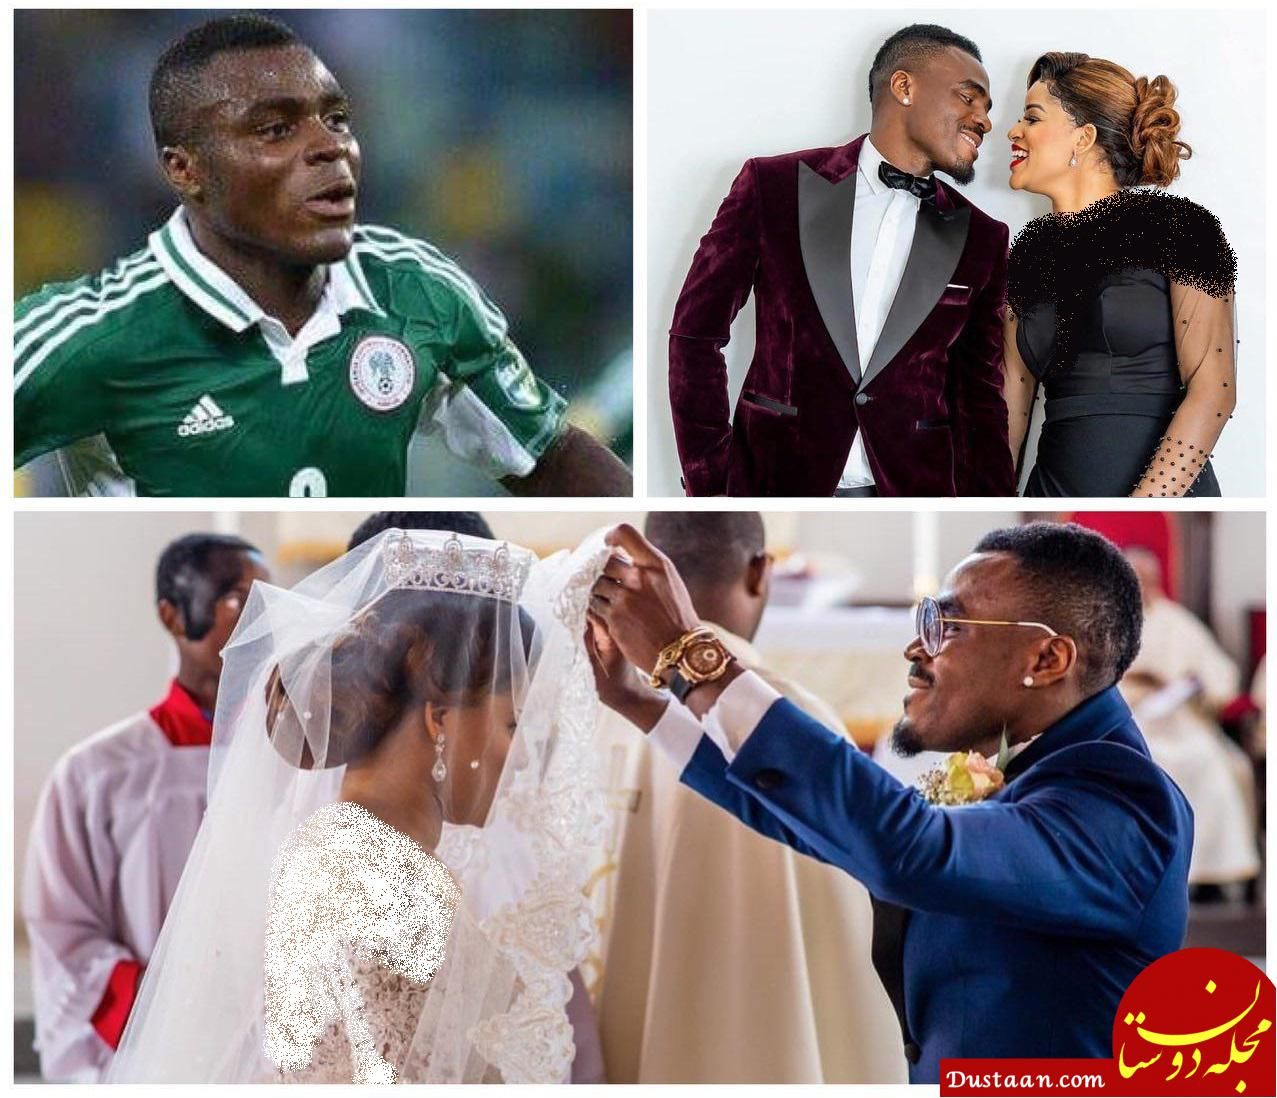 www.dustaan.com ازدواج جنجالی فوتبالیست مشهور با زیباترین دختر نیجریه! +عکس